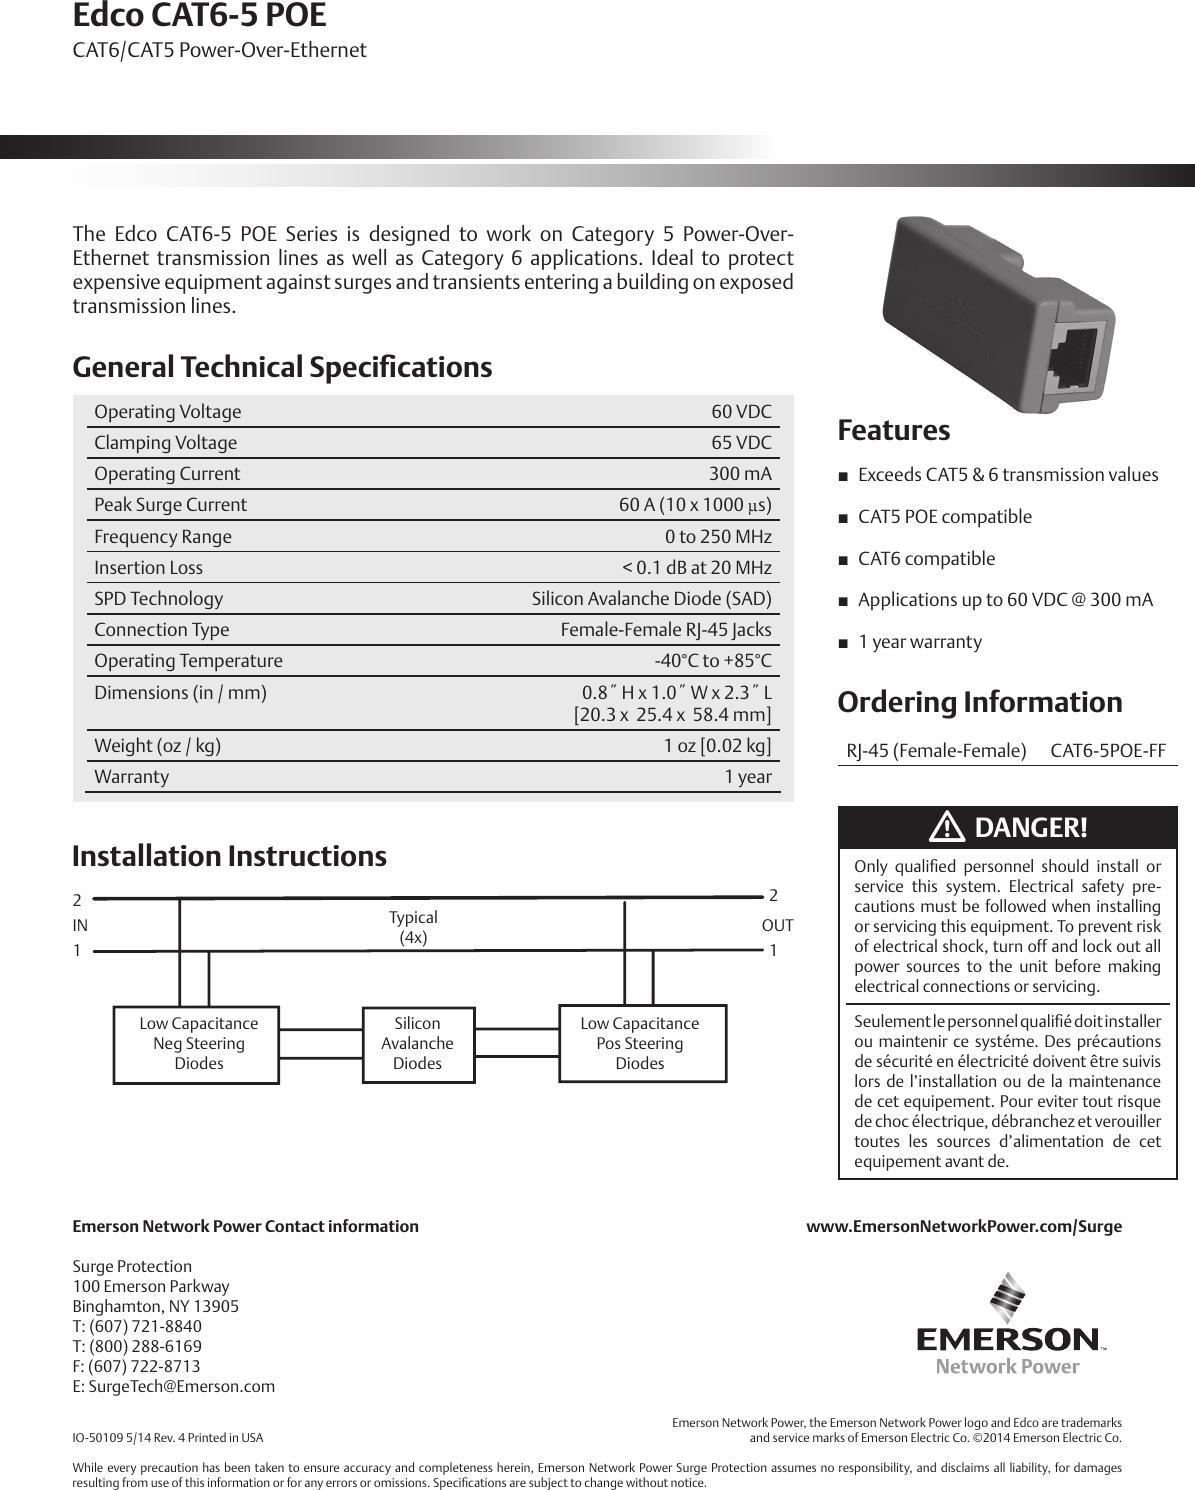 Emerson Edco Cat6 5 Poe Power Over Ethernet Installation Manual Io Wiring Instructions 50109 Edcocat6 5poe 14